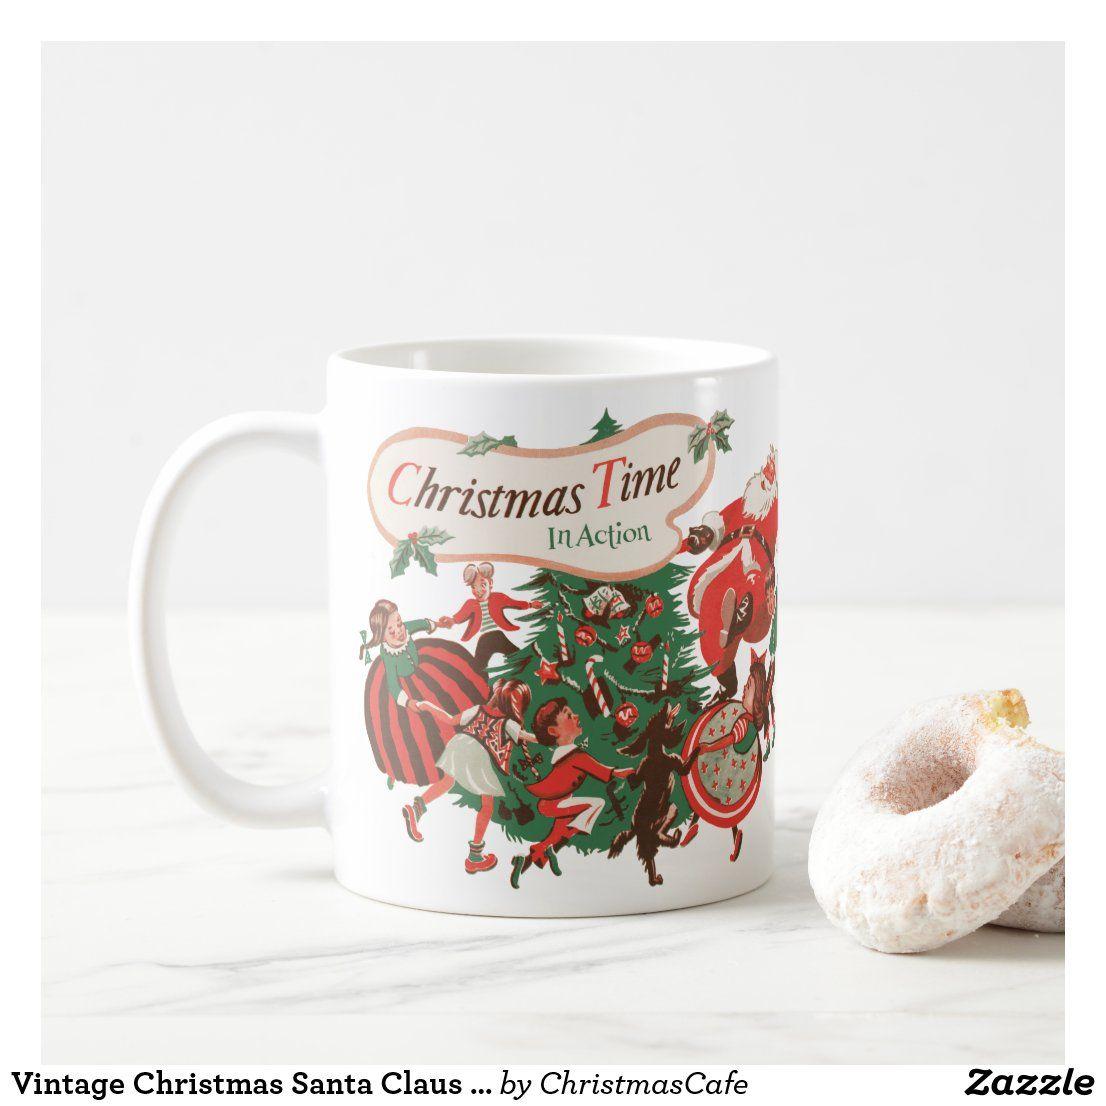 Vintage Christmas Santa Claus And Dancing Children Coffee Mug Zazzle Com In 2020 Vintage Christmas Custom Holiday Card Mugs